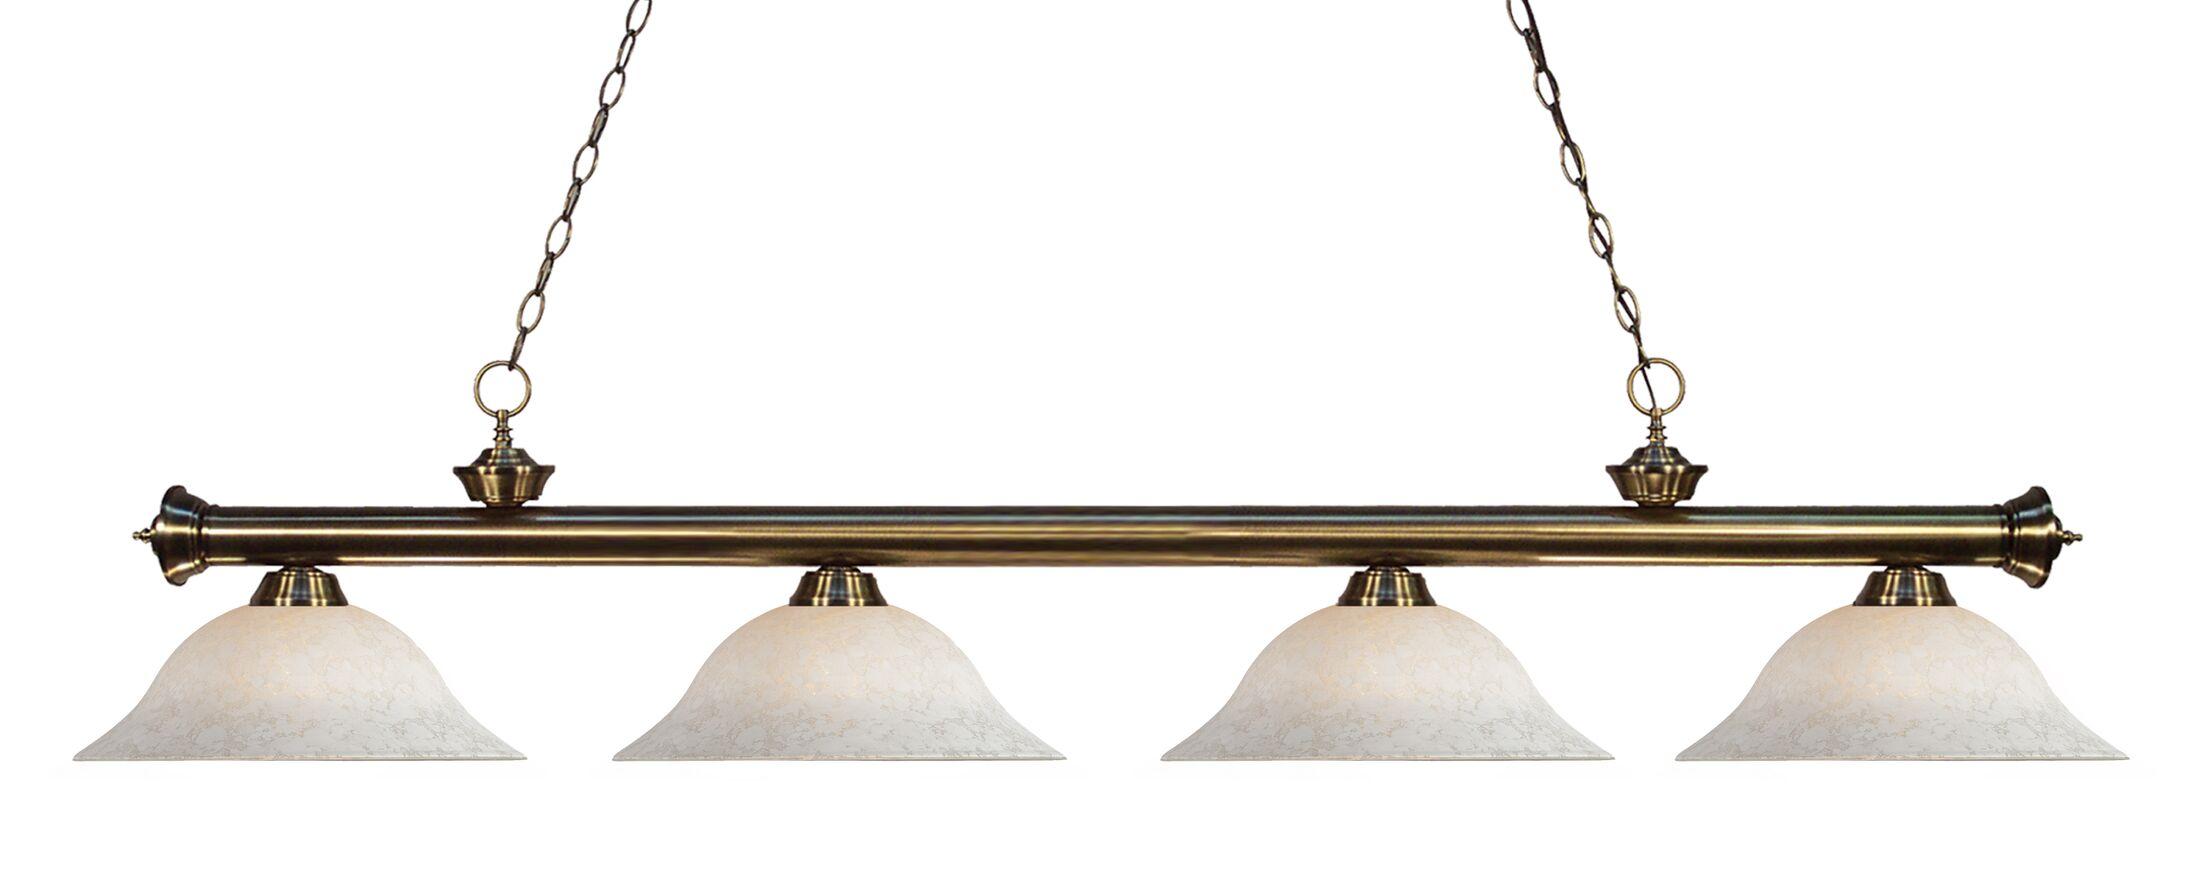 Zephyr 4-Light Steel Kitchen Island Pendant Finish: Antique Brass, Shade Color: White Mottle